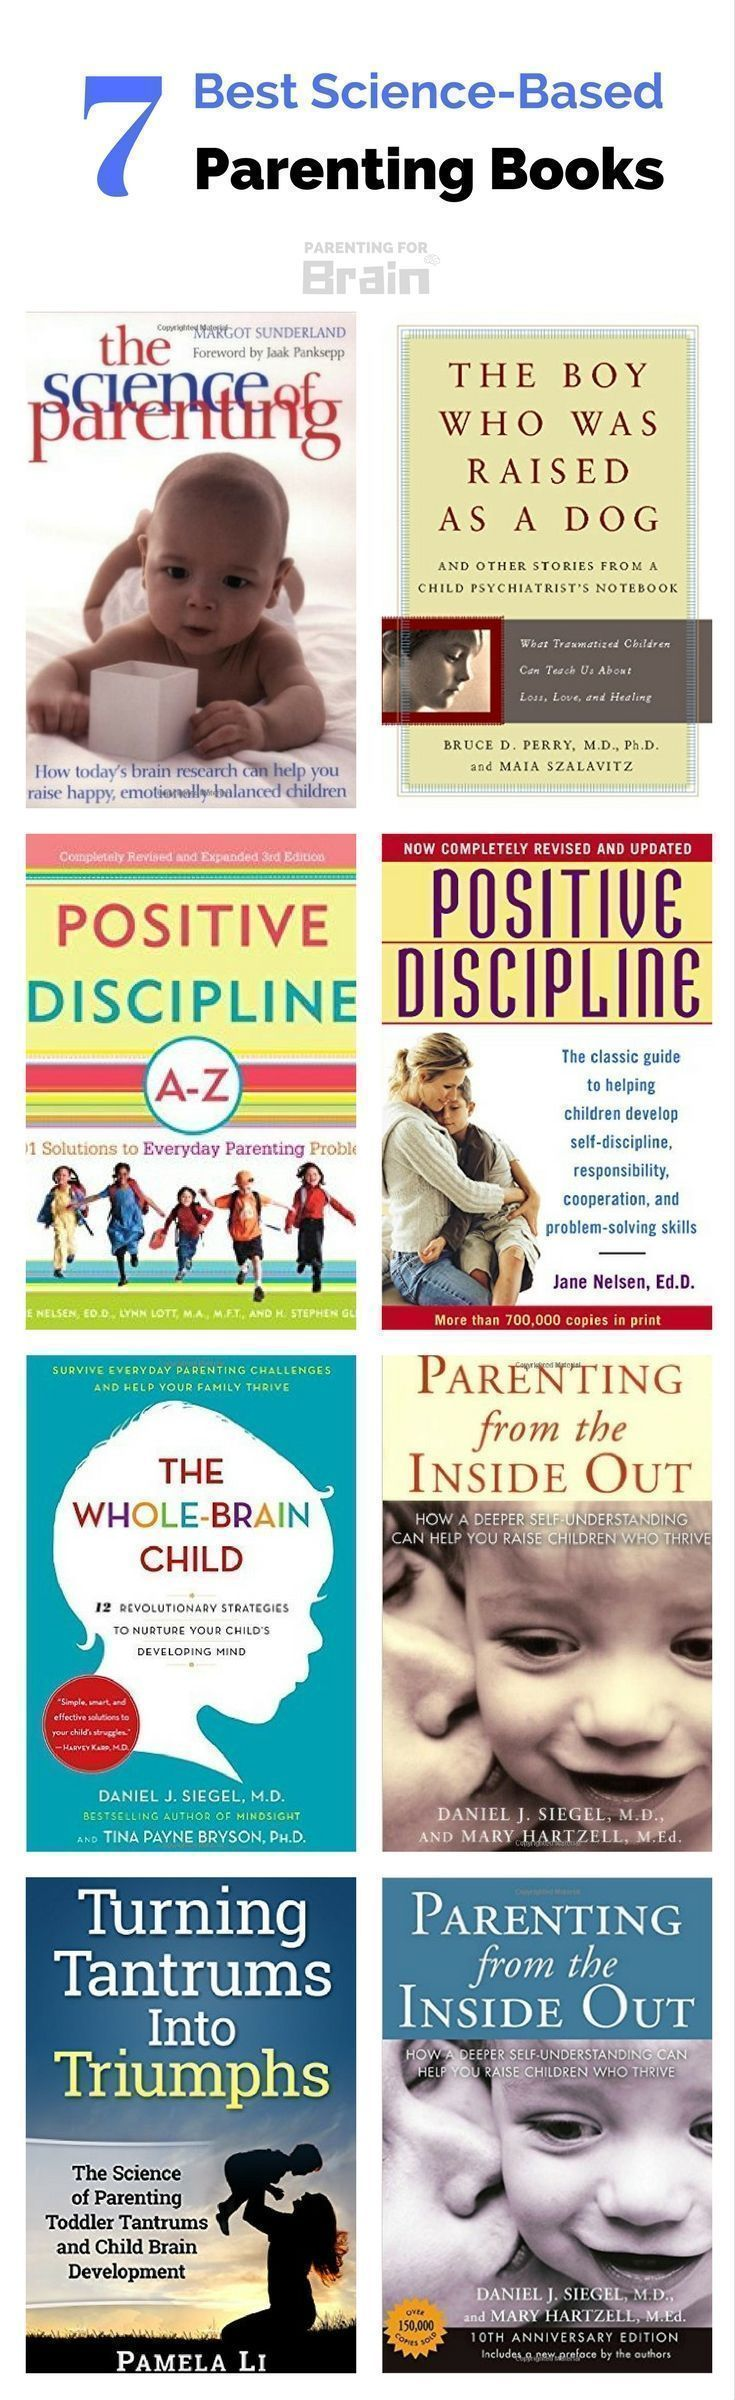 Best Science-Based Parenting Books #Parenting #ParentingBooks #parentingforbrain